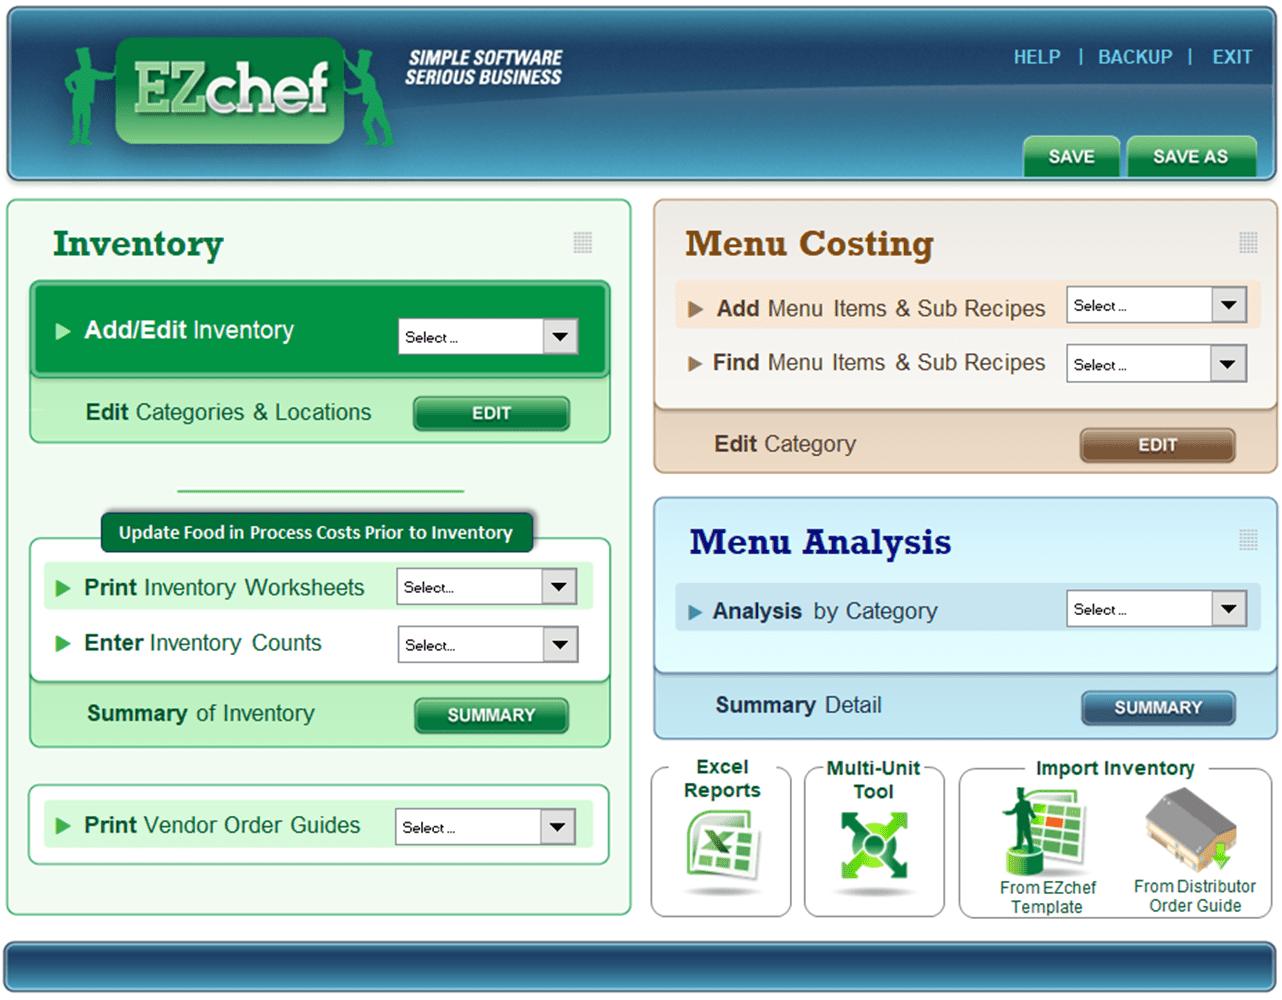 Restaurant Resource Group Ezchef Software Inventory